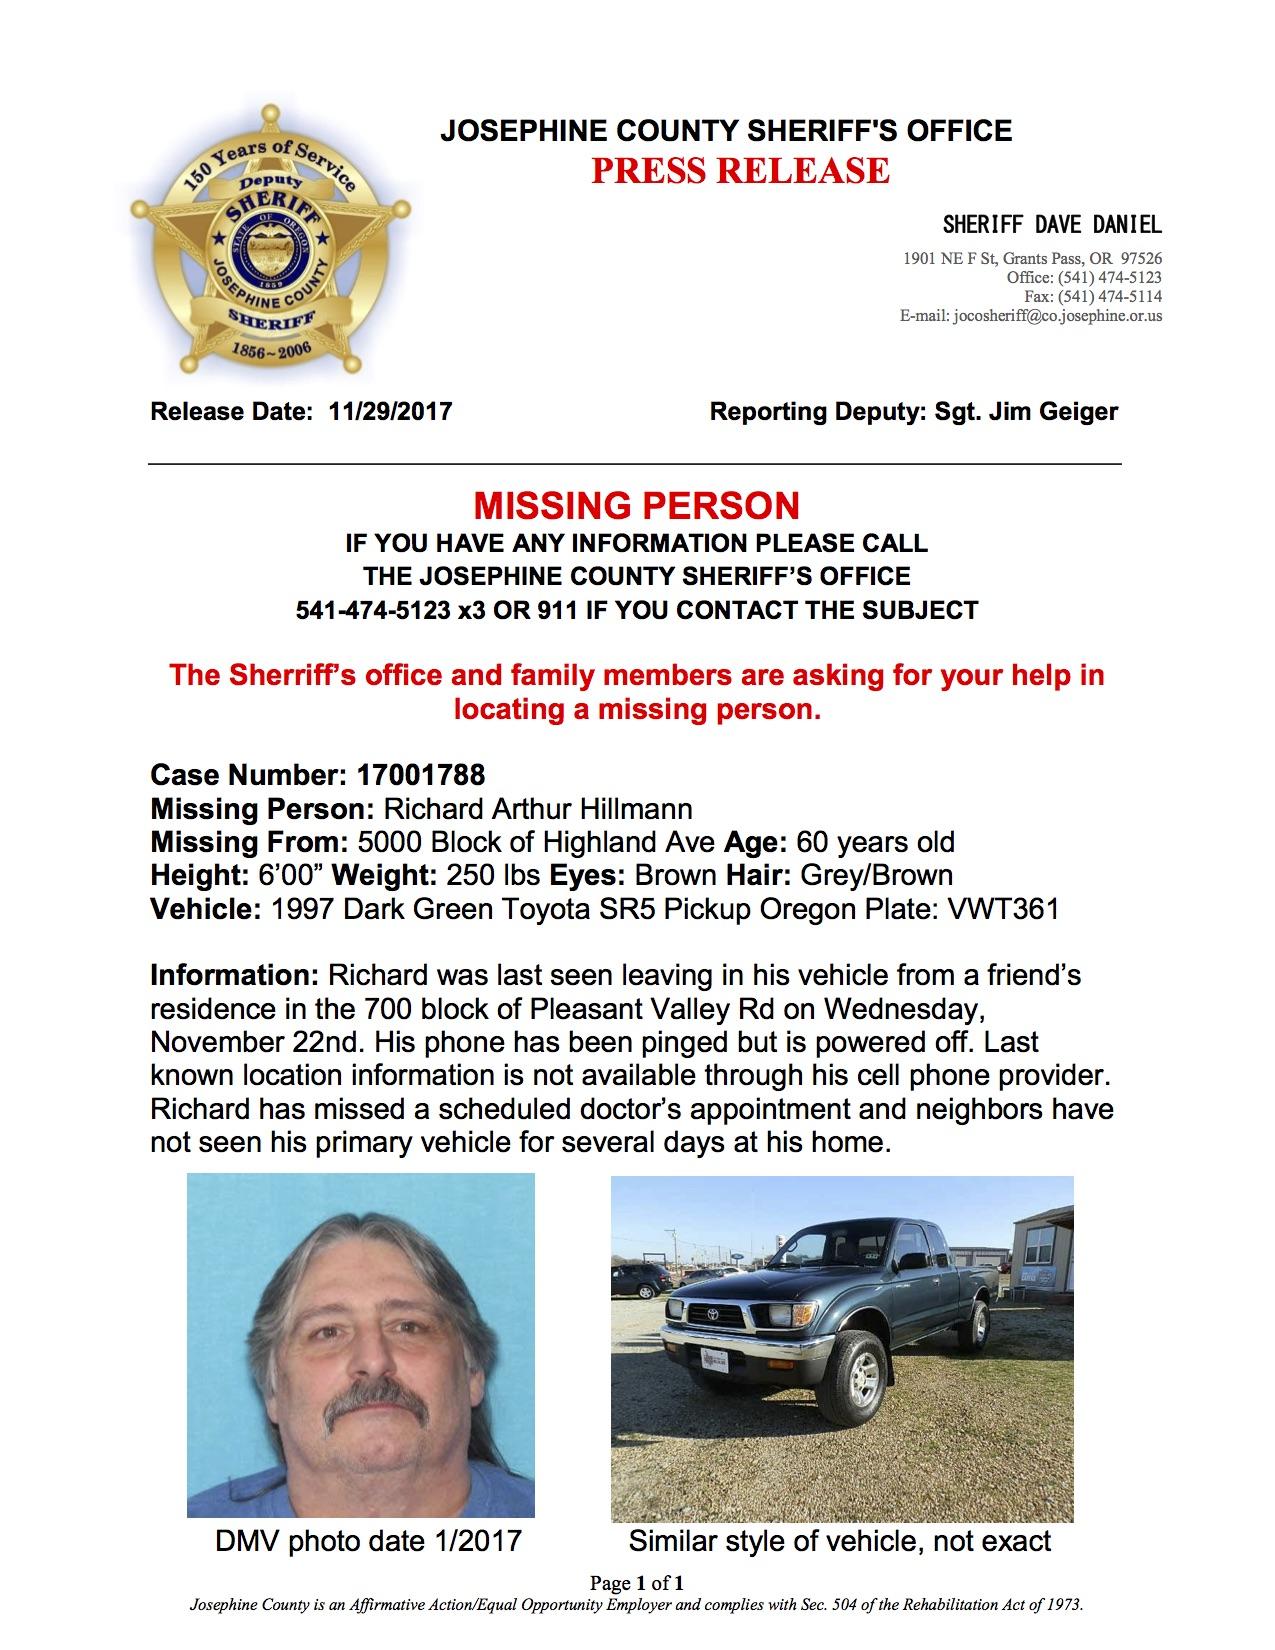 Hillmann Missing 17001788 - Copy.jpg